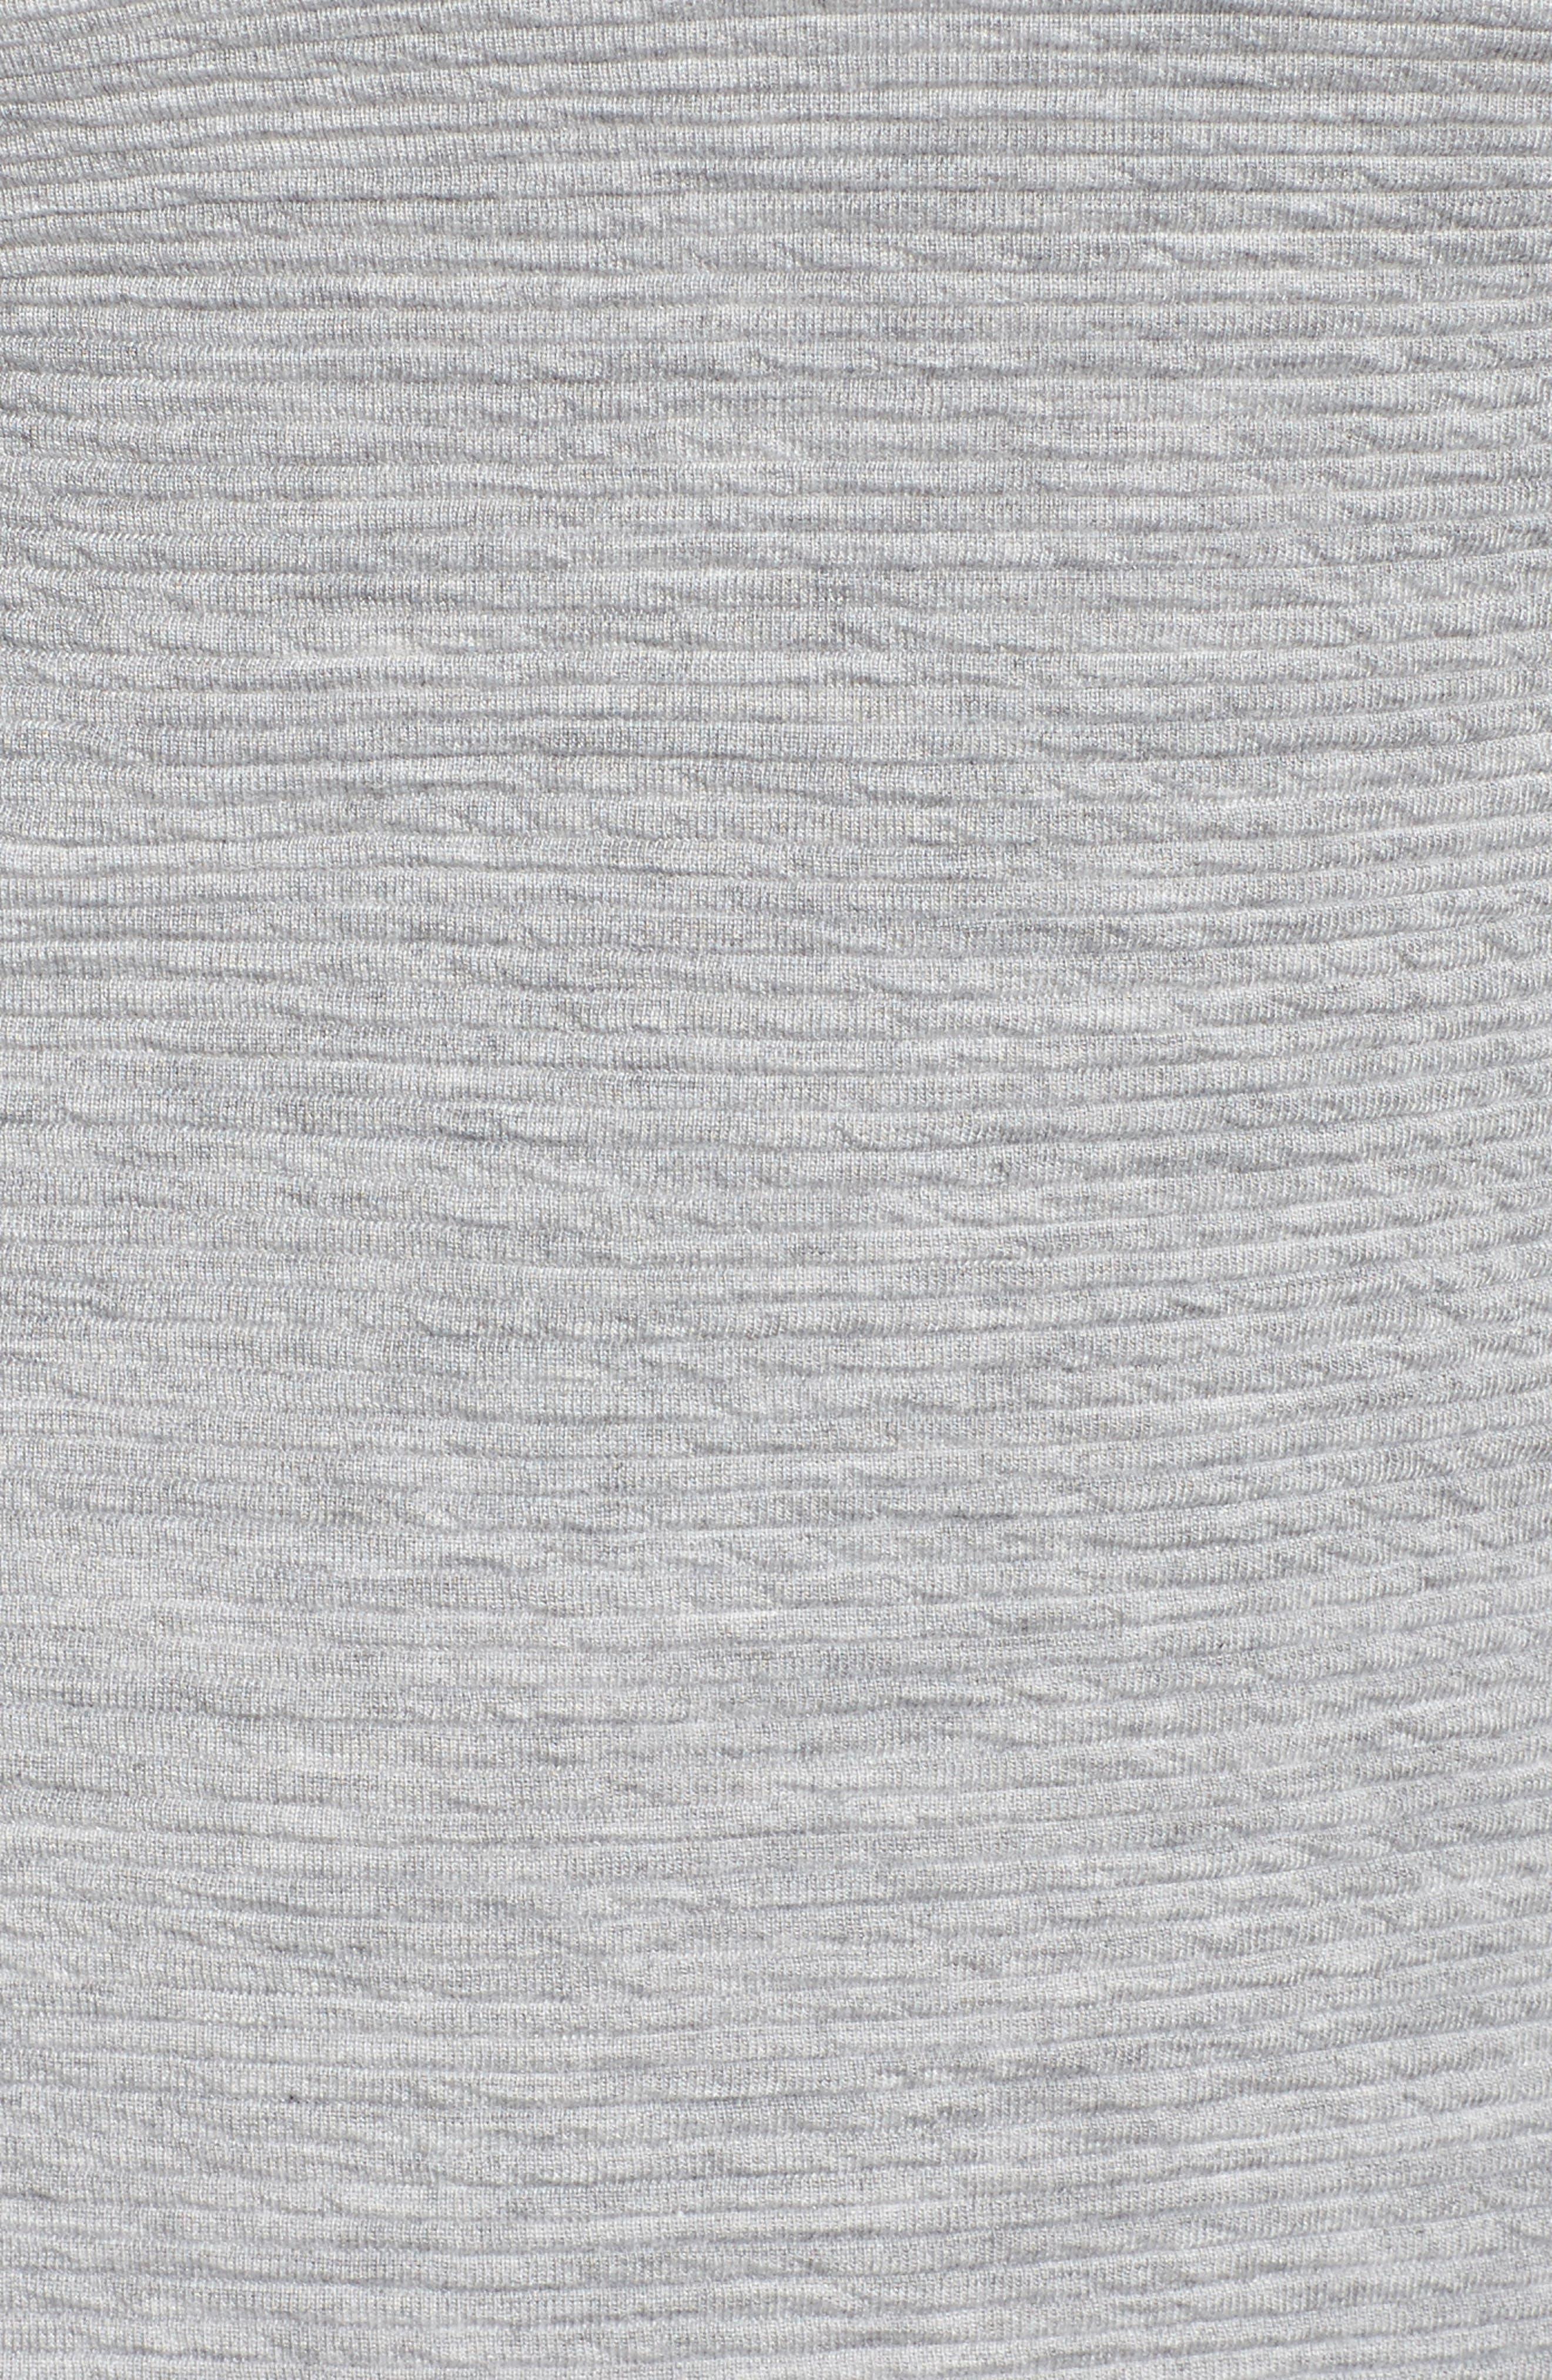 Sudan Marl Sheath Dress,                             Alternate thumbnail 5, color,                             Mid Grey Mel